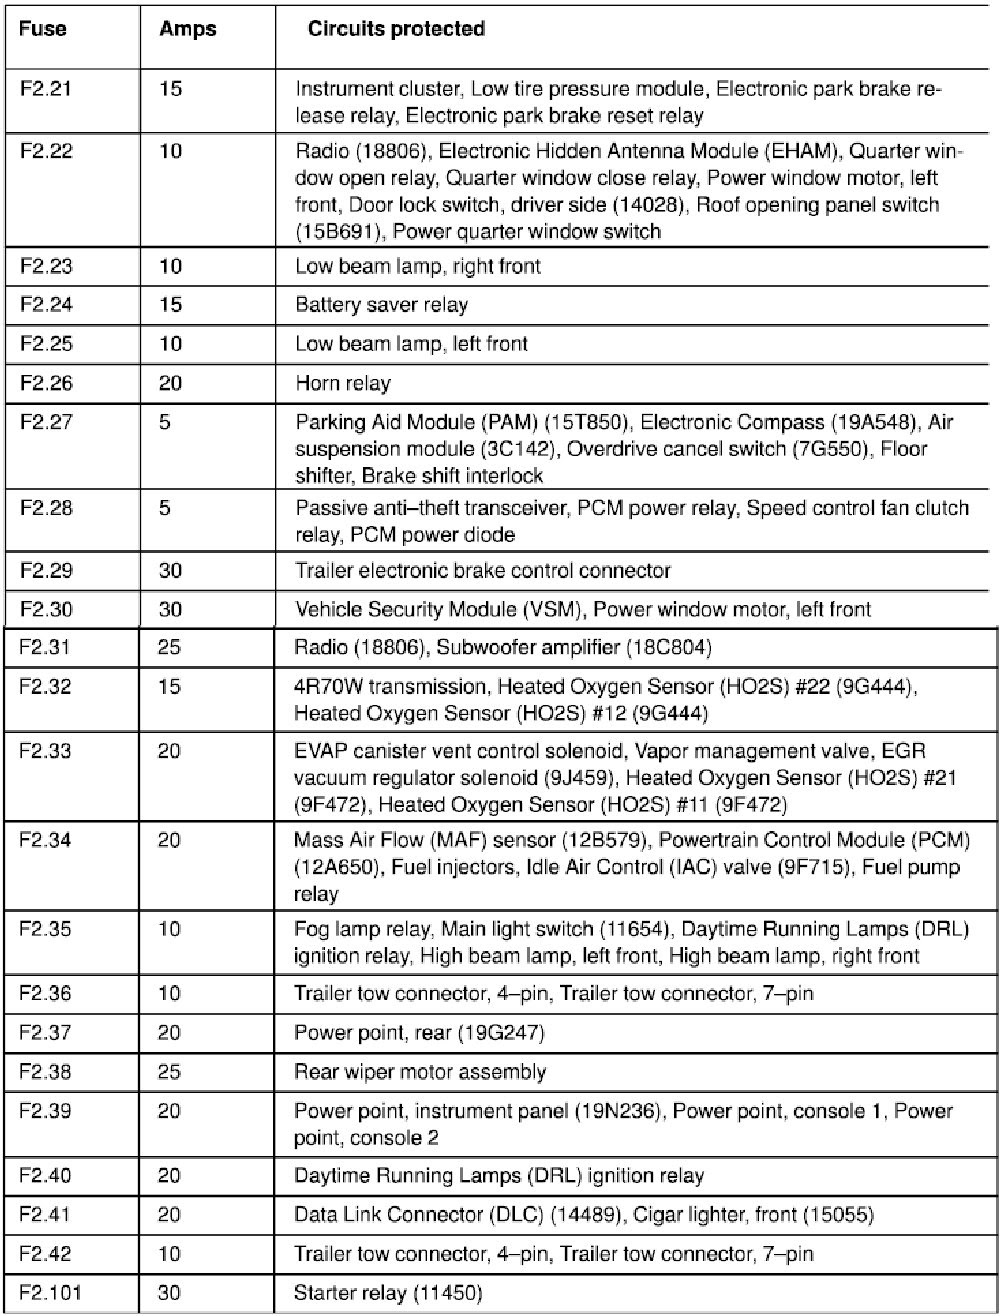 06 Expedition Fuse Diagram Harley Davidson Relay Wiring Diagram Wiring Diagram Schematics